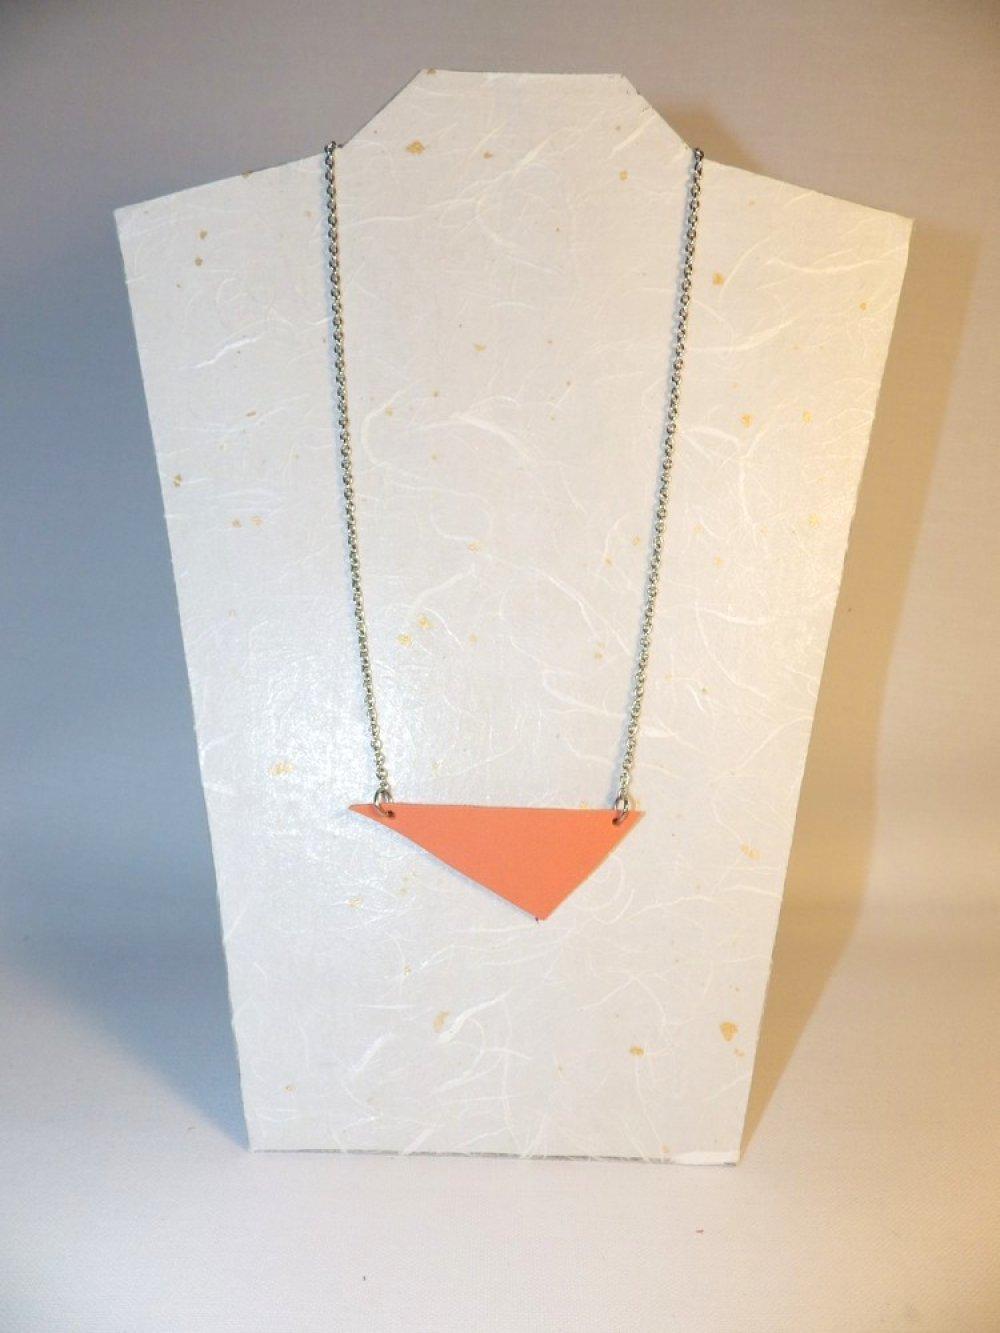 Collier triangle en cuir et inox, orange abricot